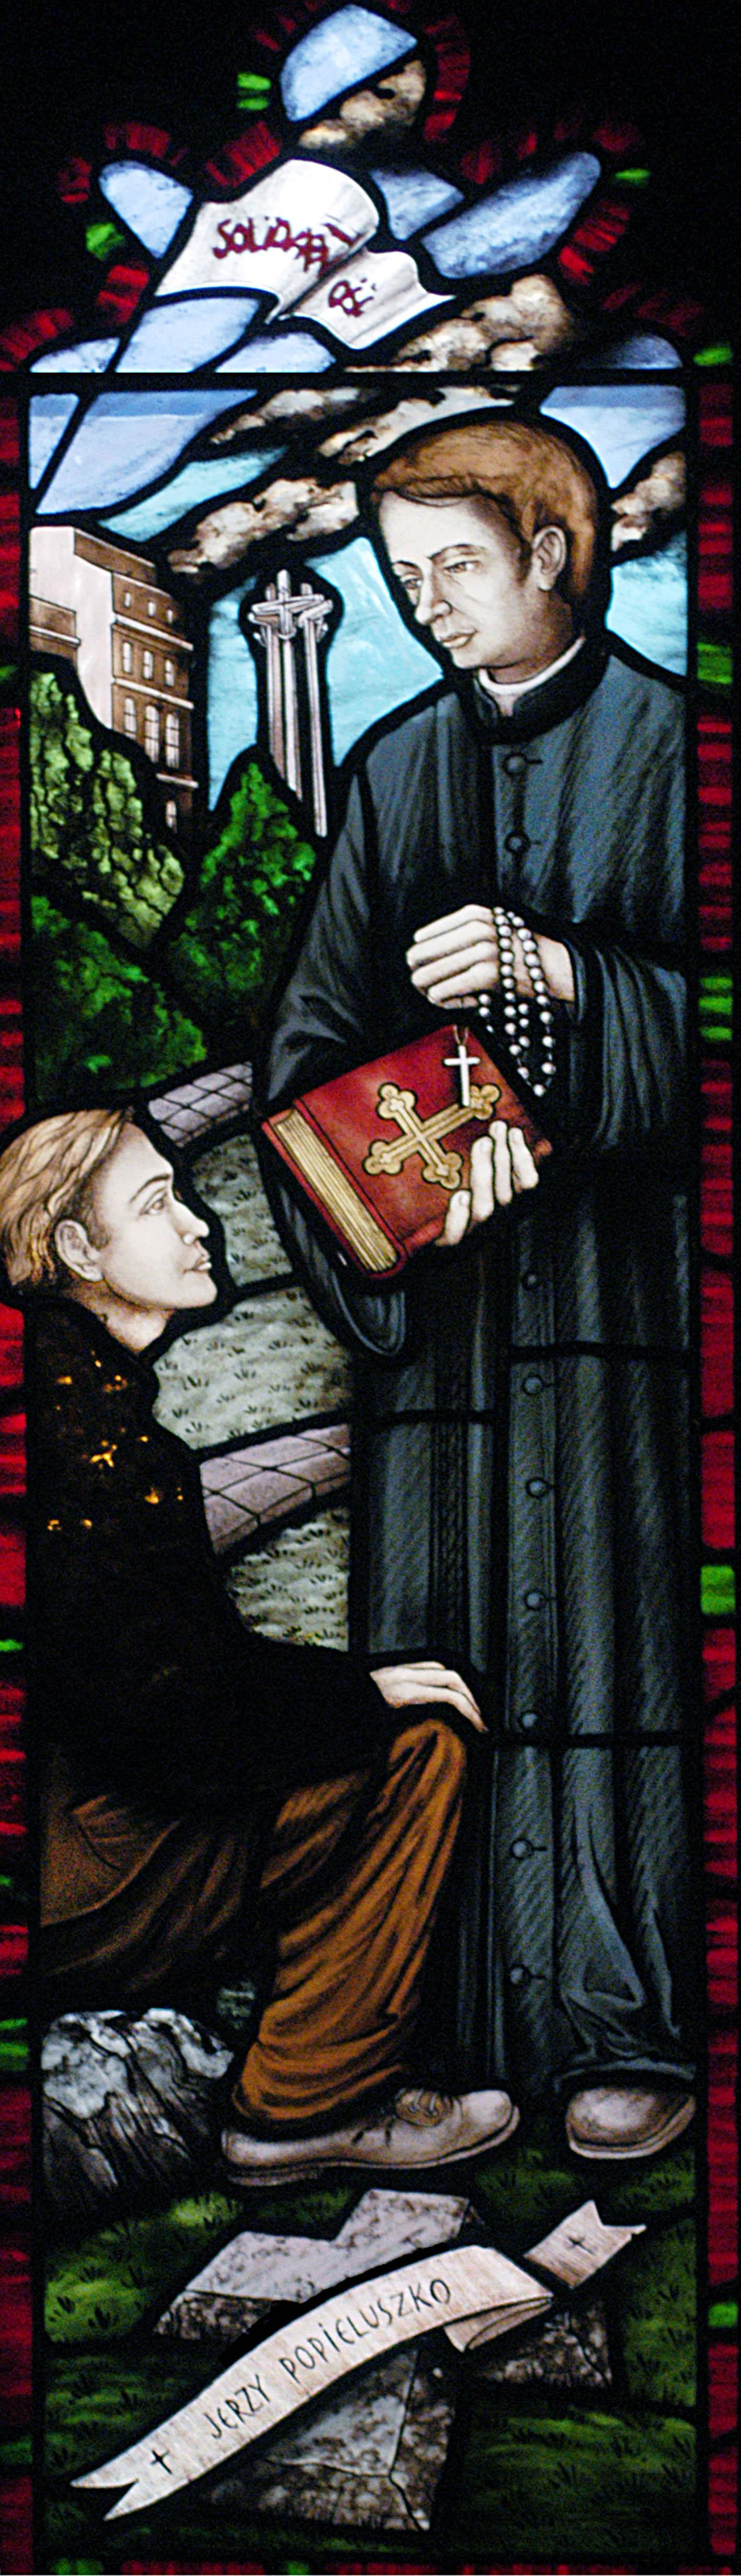 Jerzy Popieluszko - St Thomas Aquinas Church - Newman Center - Toronto